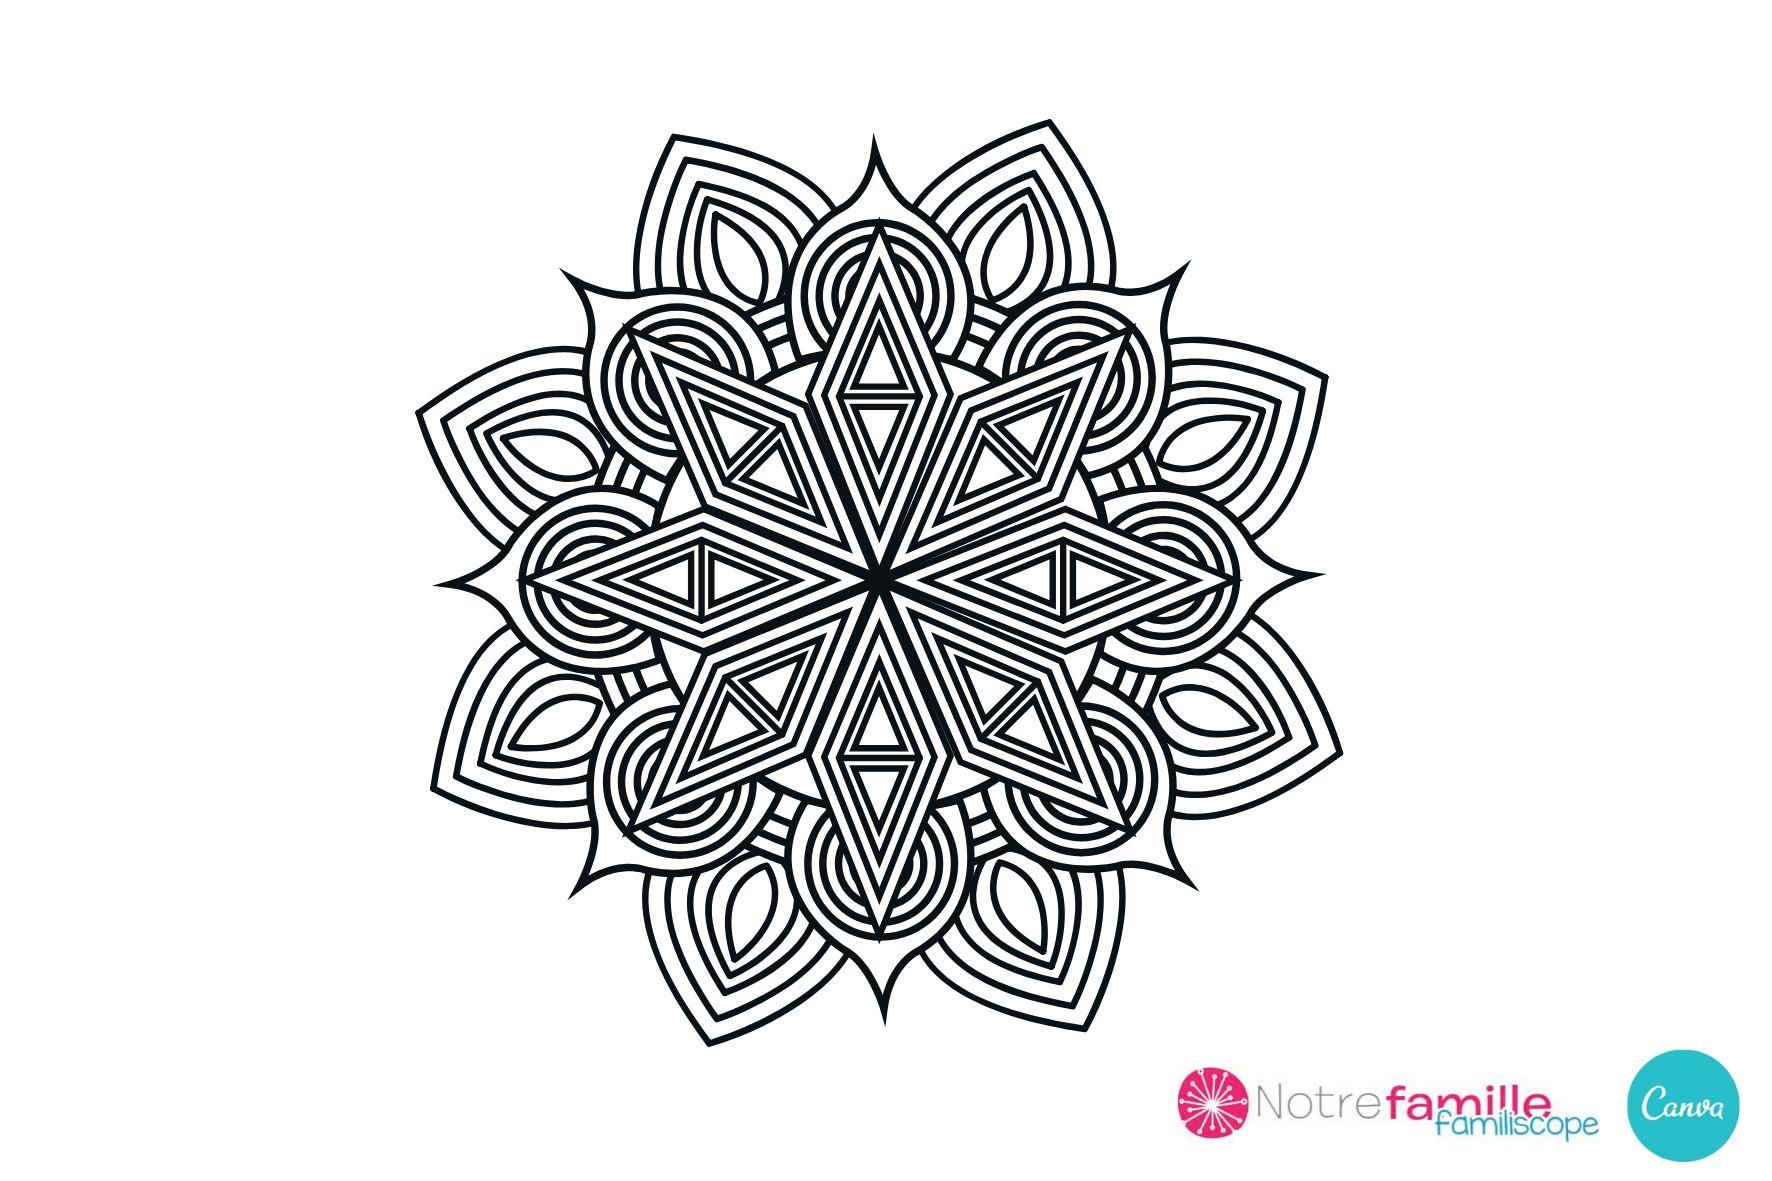 Coloriage De Mandala À Imprimer - Niveau Facile encequiconcerne Mandala À Imprimer Facile